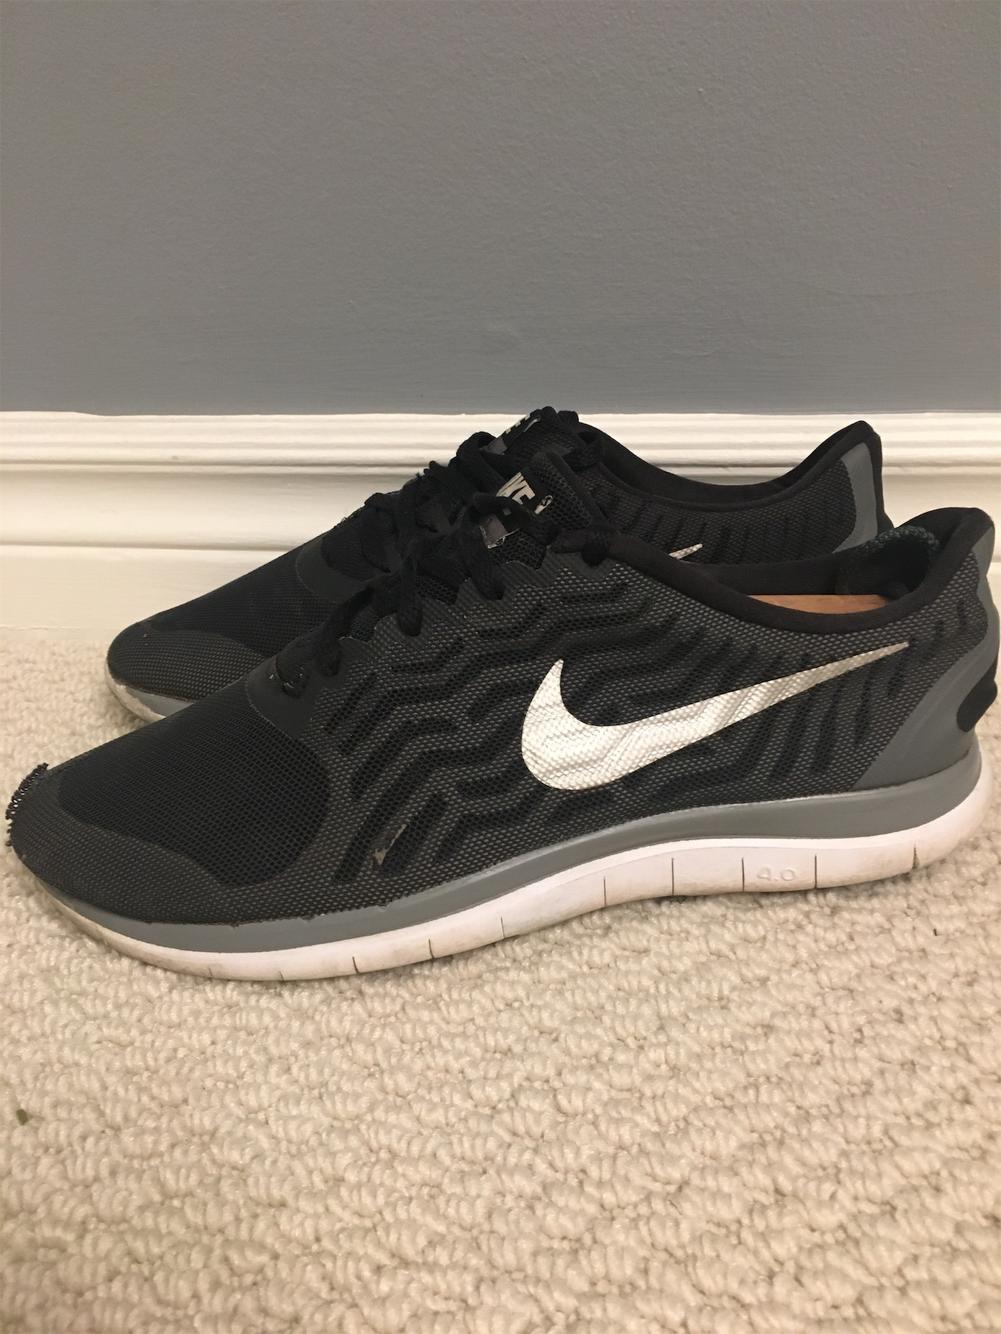 Nike Size 9.5 Women's/8 Men's Free Run